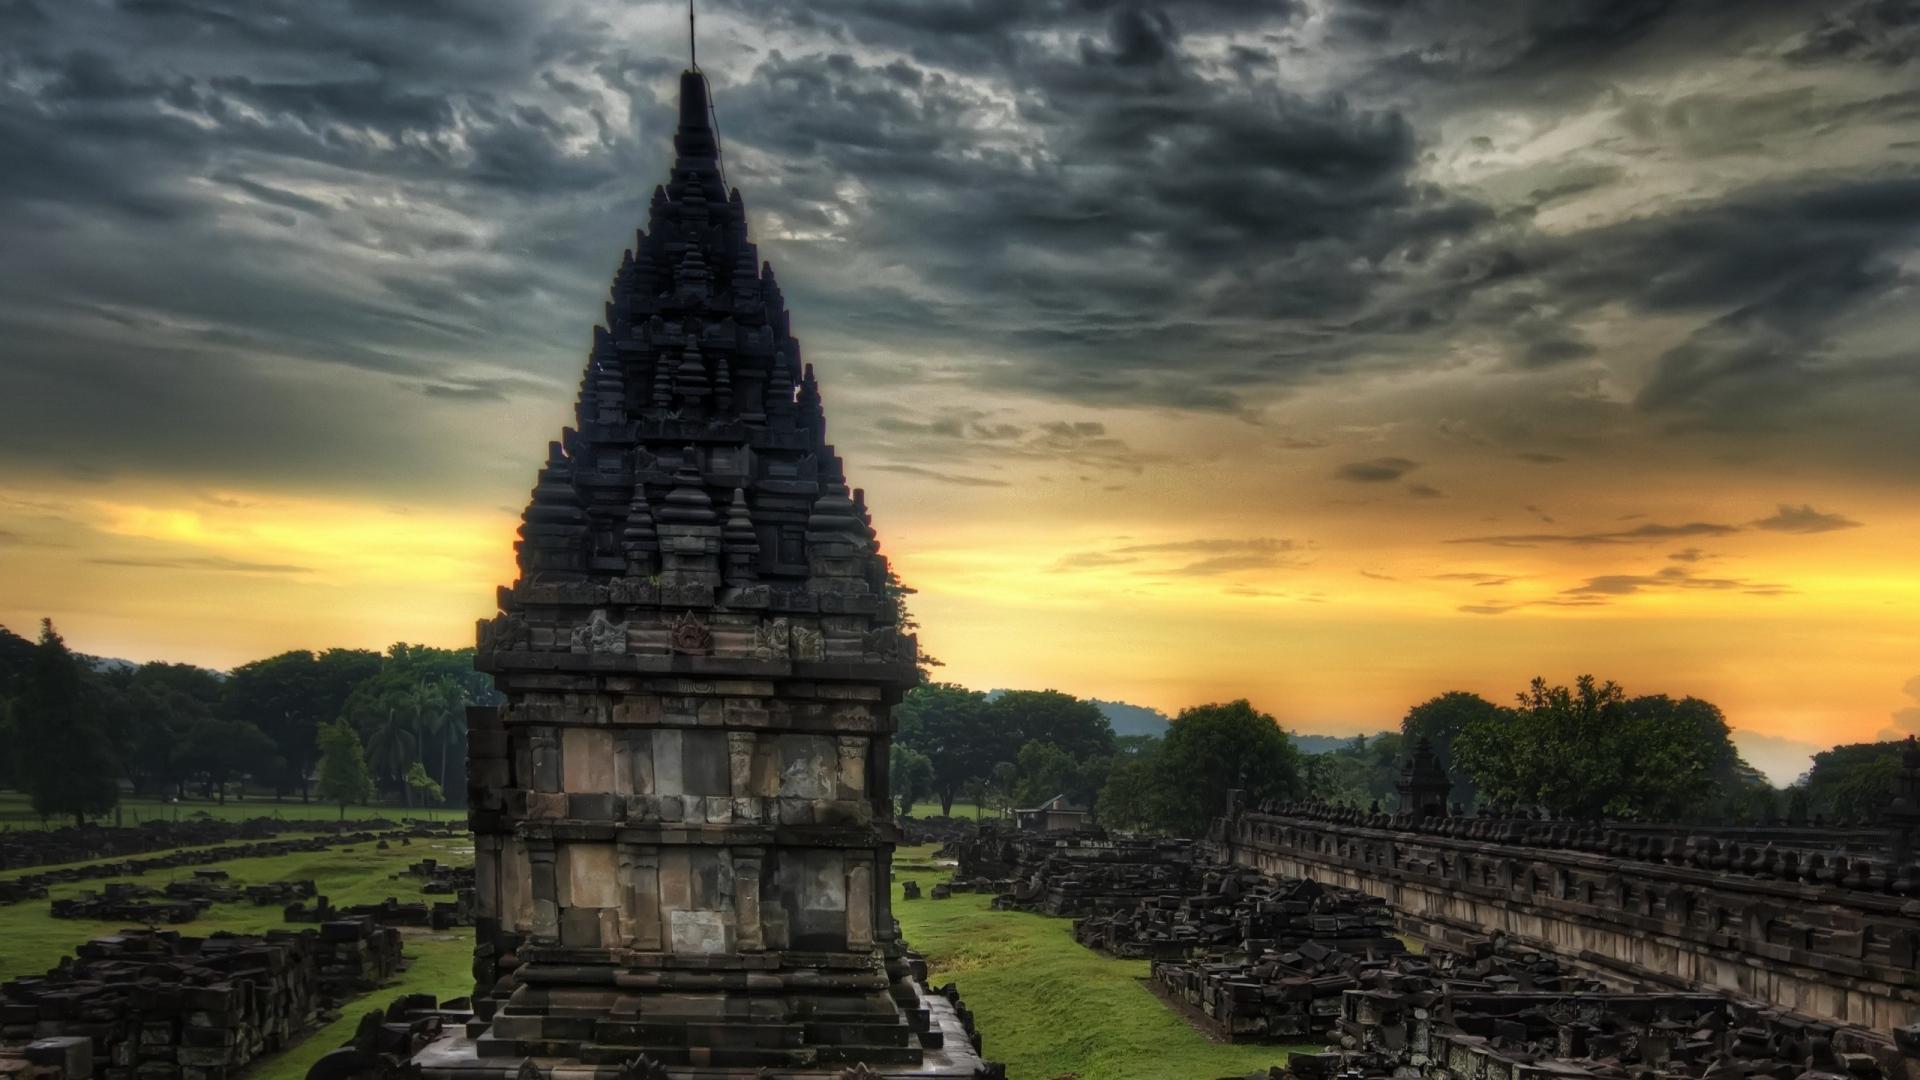 Download Wallpaper 1920x1080 temple, india, stones Full HD 1080p HD